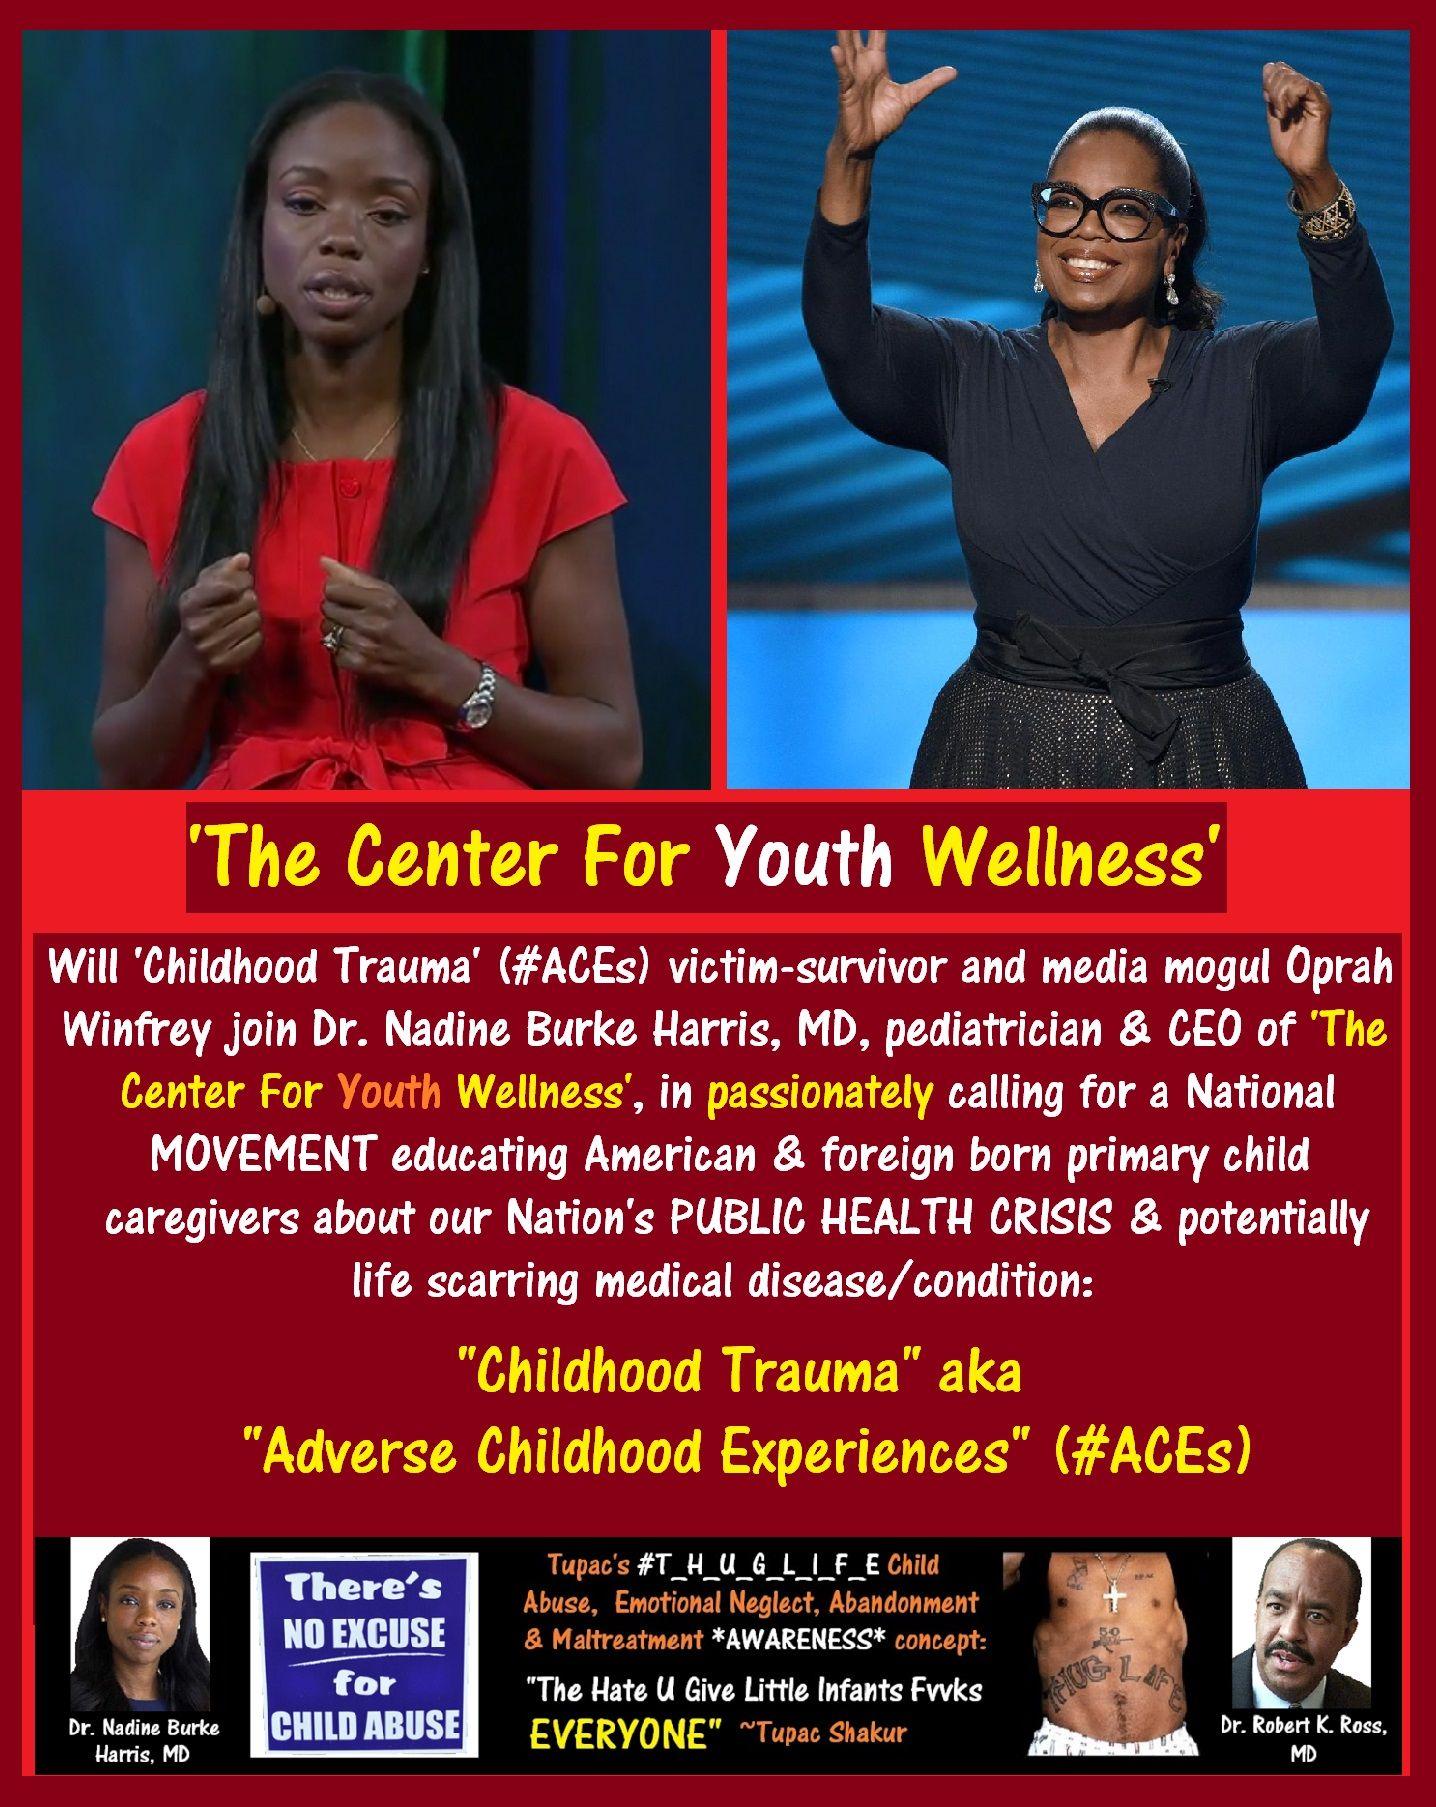 _#Oprah Winfrey Dr. Nadine Burke Harris, MD.jpg